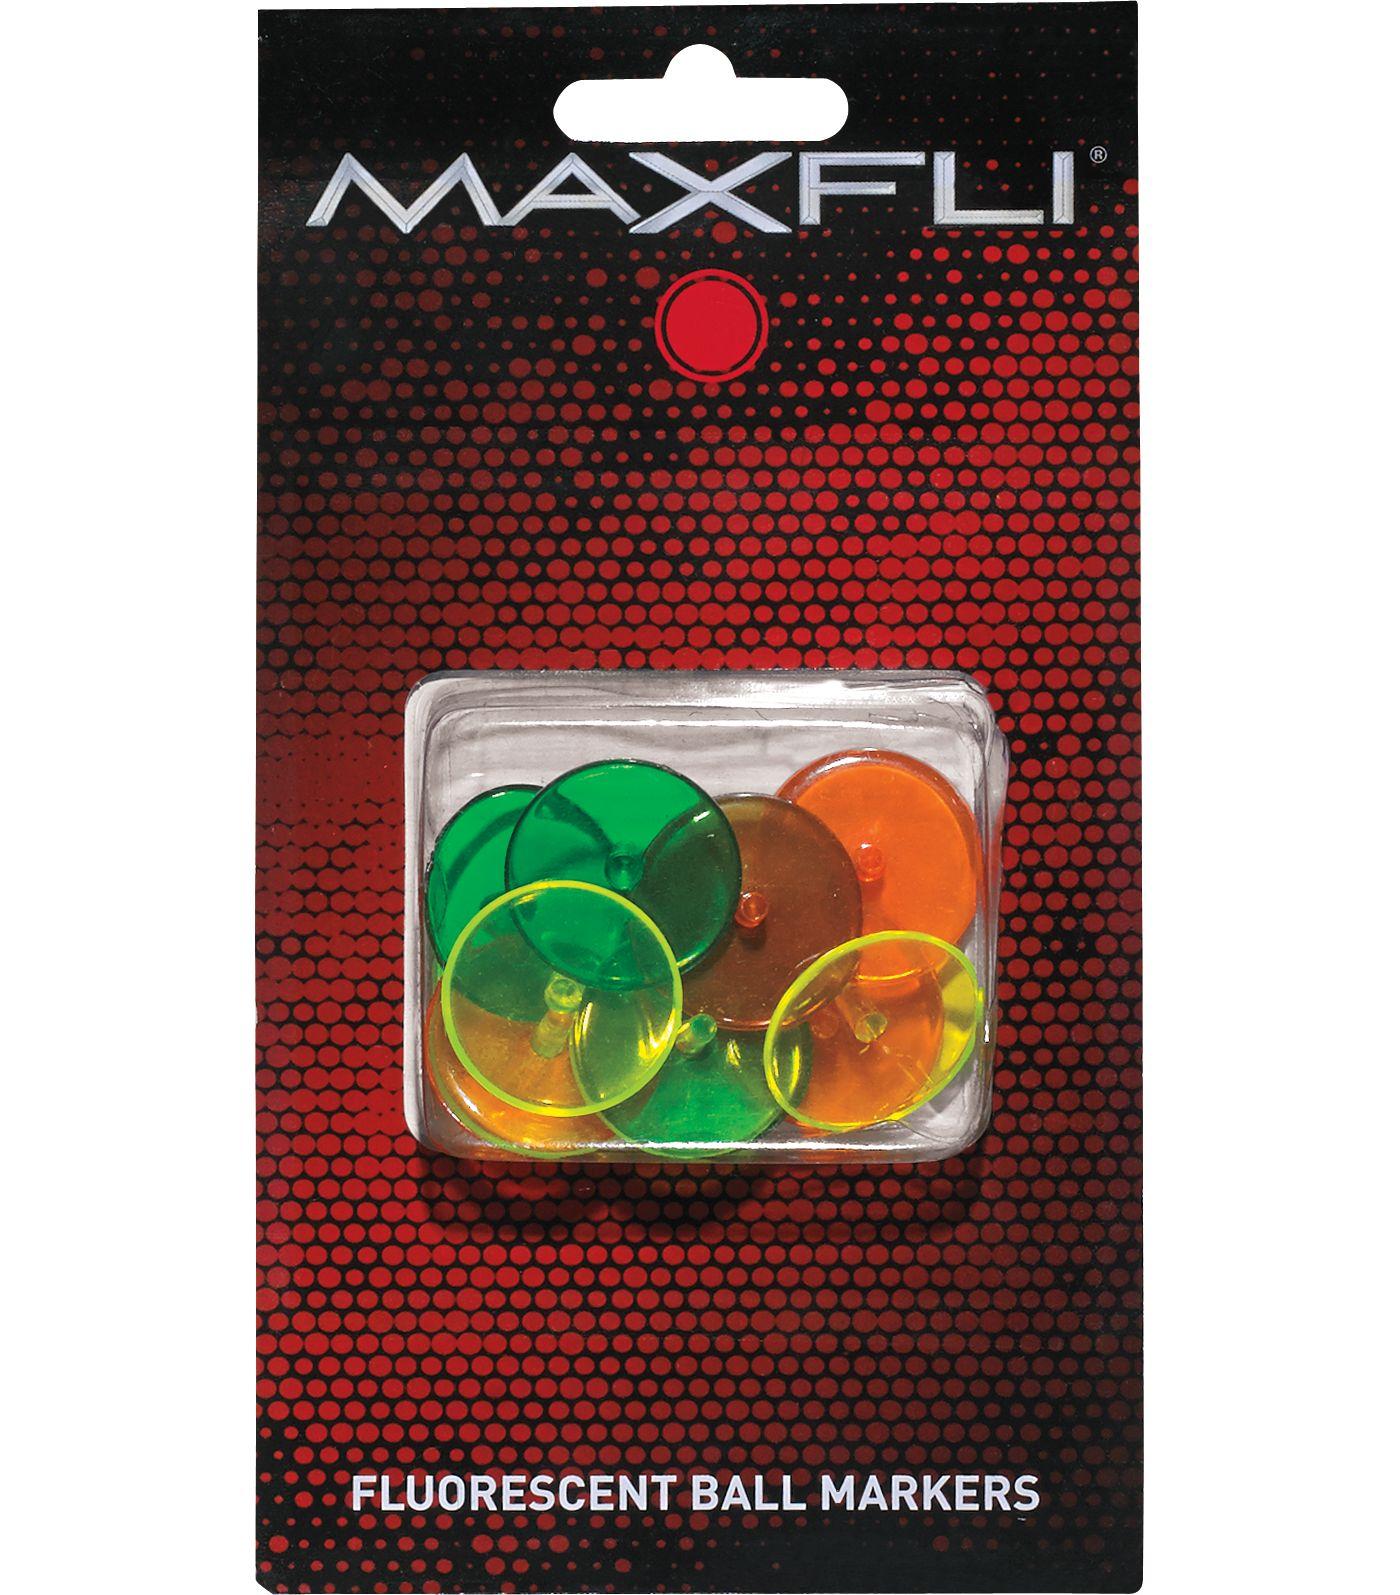 Maxfli Florescent Ball Markers